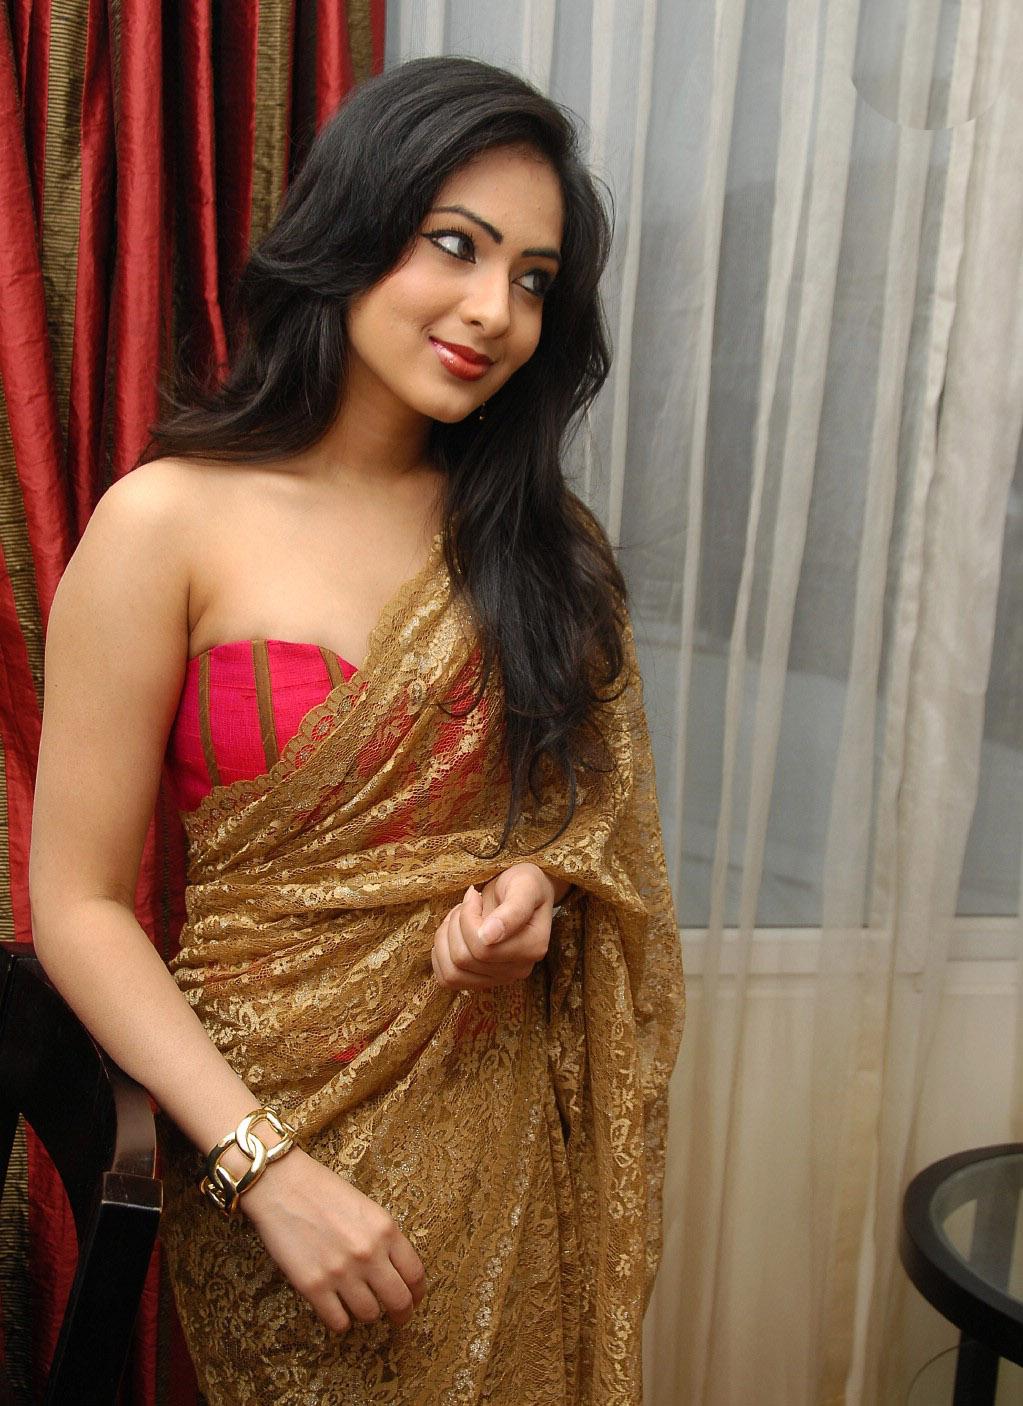 ASIAN GIRLS: SEXY INDIAN MODEL EXBII NEW SEXY MODEL IN